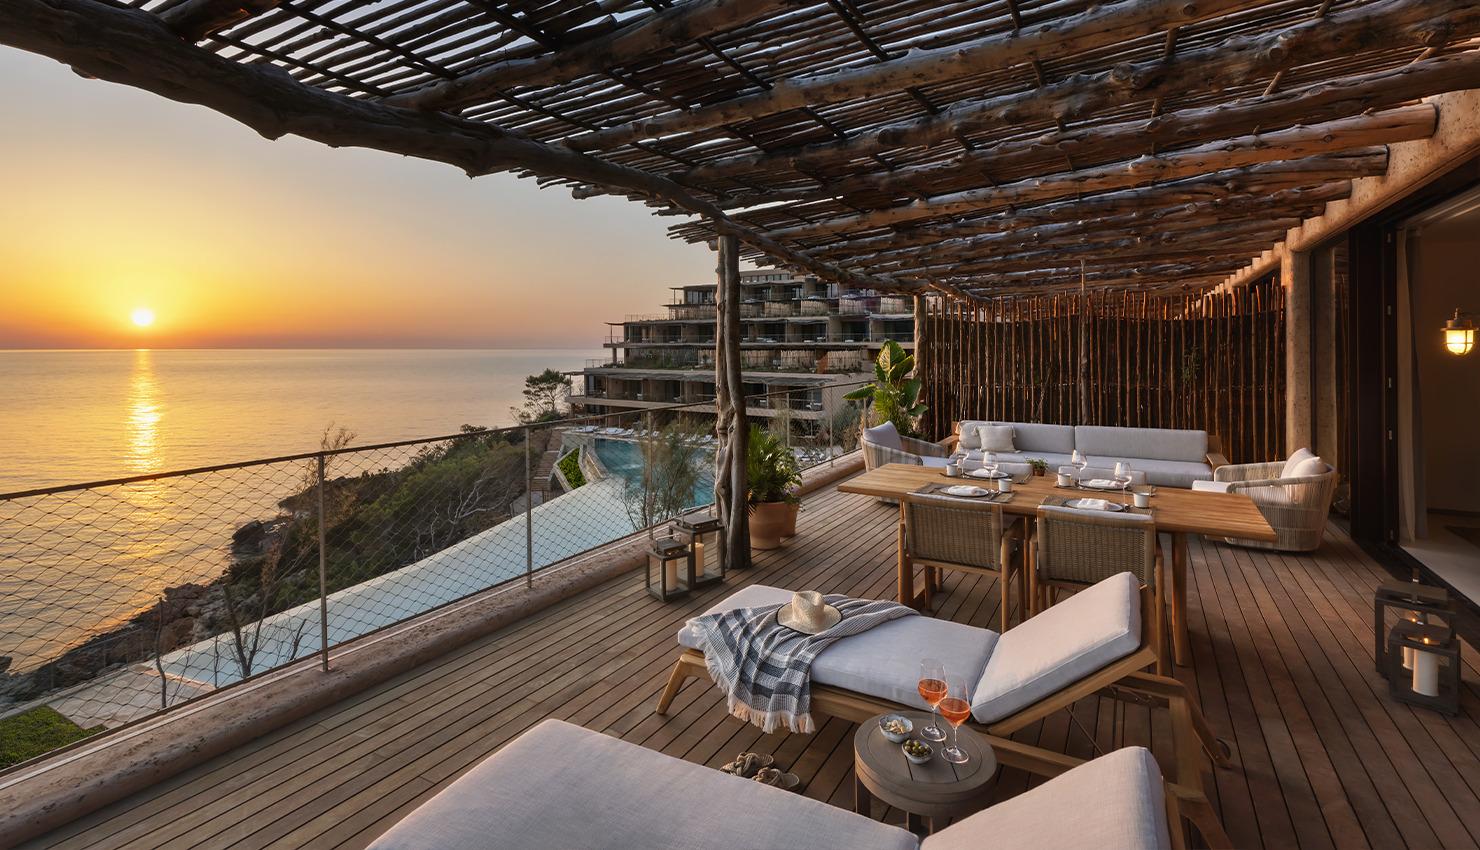 ibiza-hoteles-sostenibles-magazinehorse